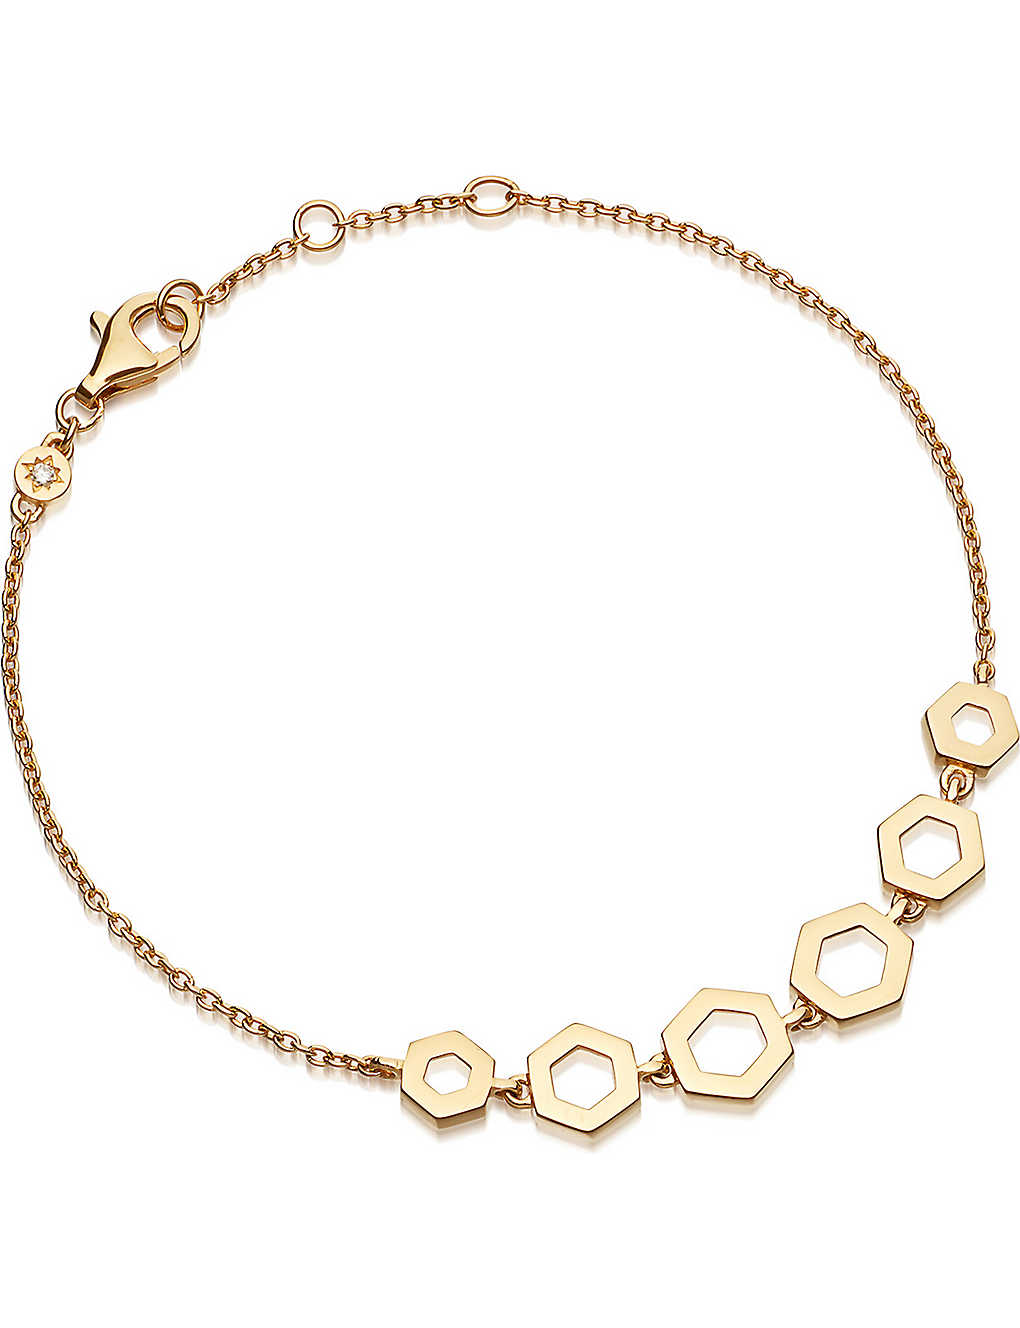 ASTLEY CLARKE - Honeycomb 14ct yellow-gold bracelet